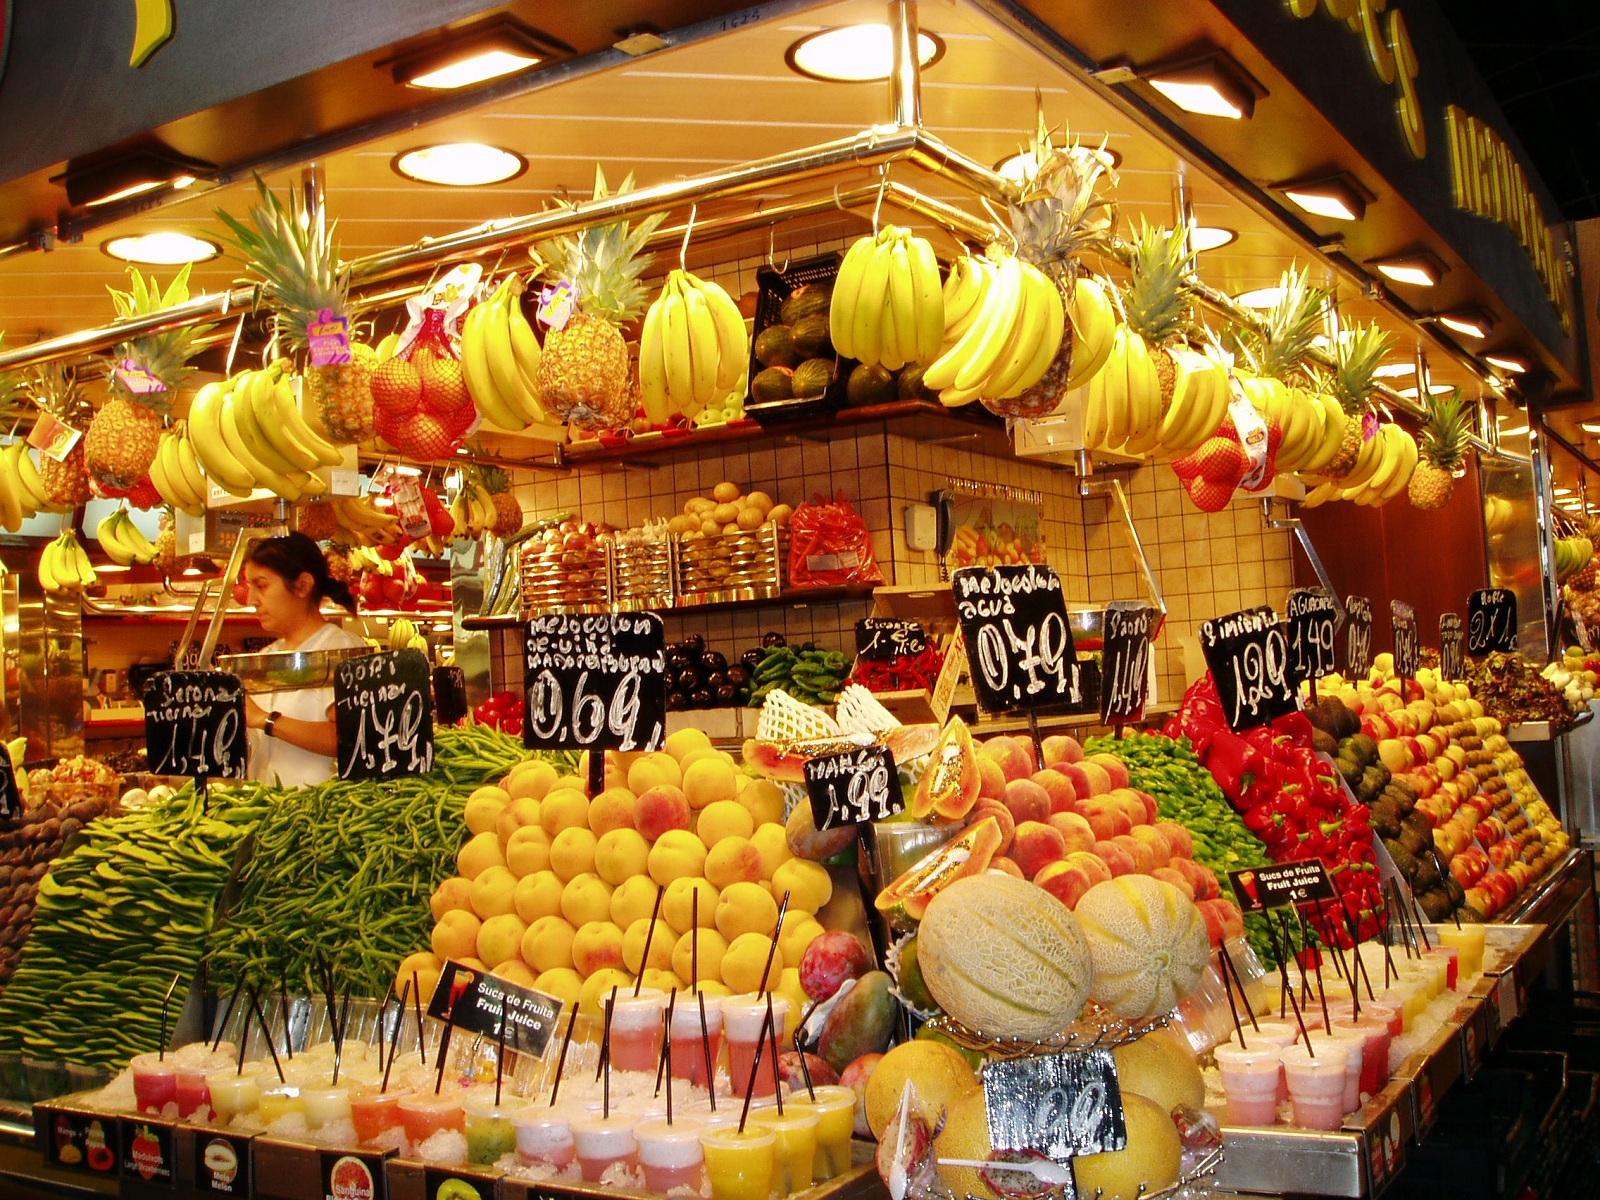 Barcelona Spain Food Markets